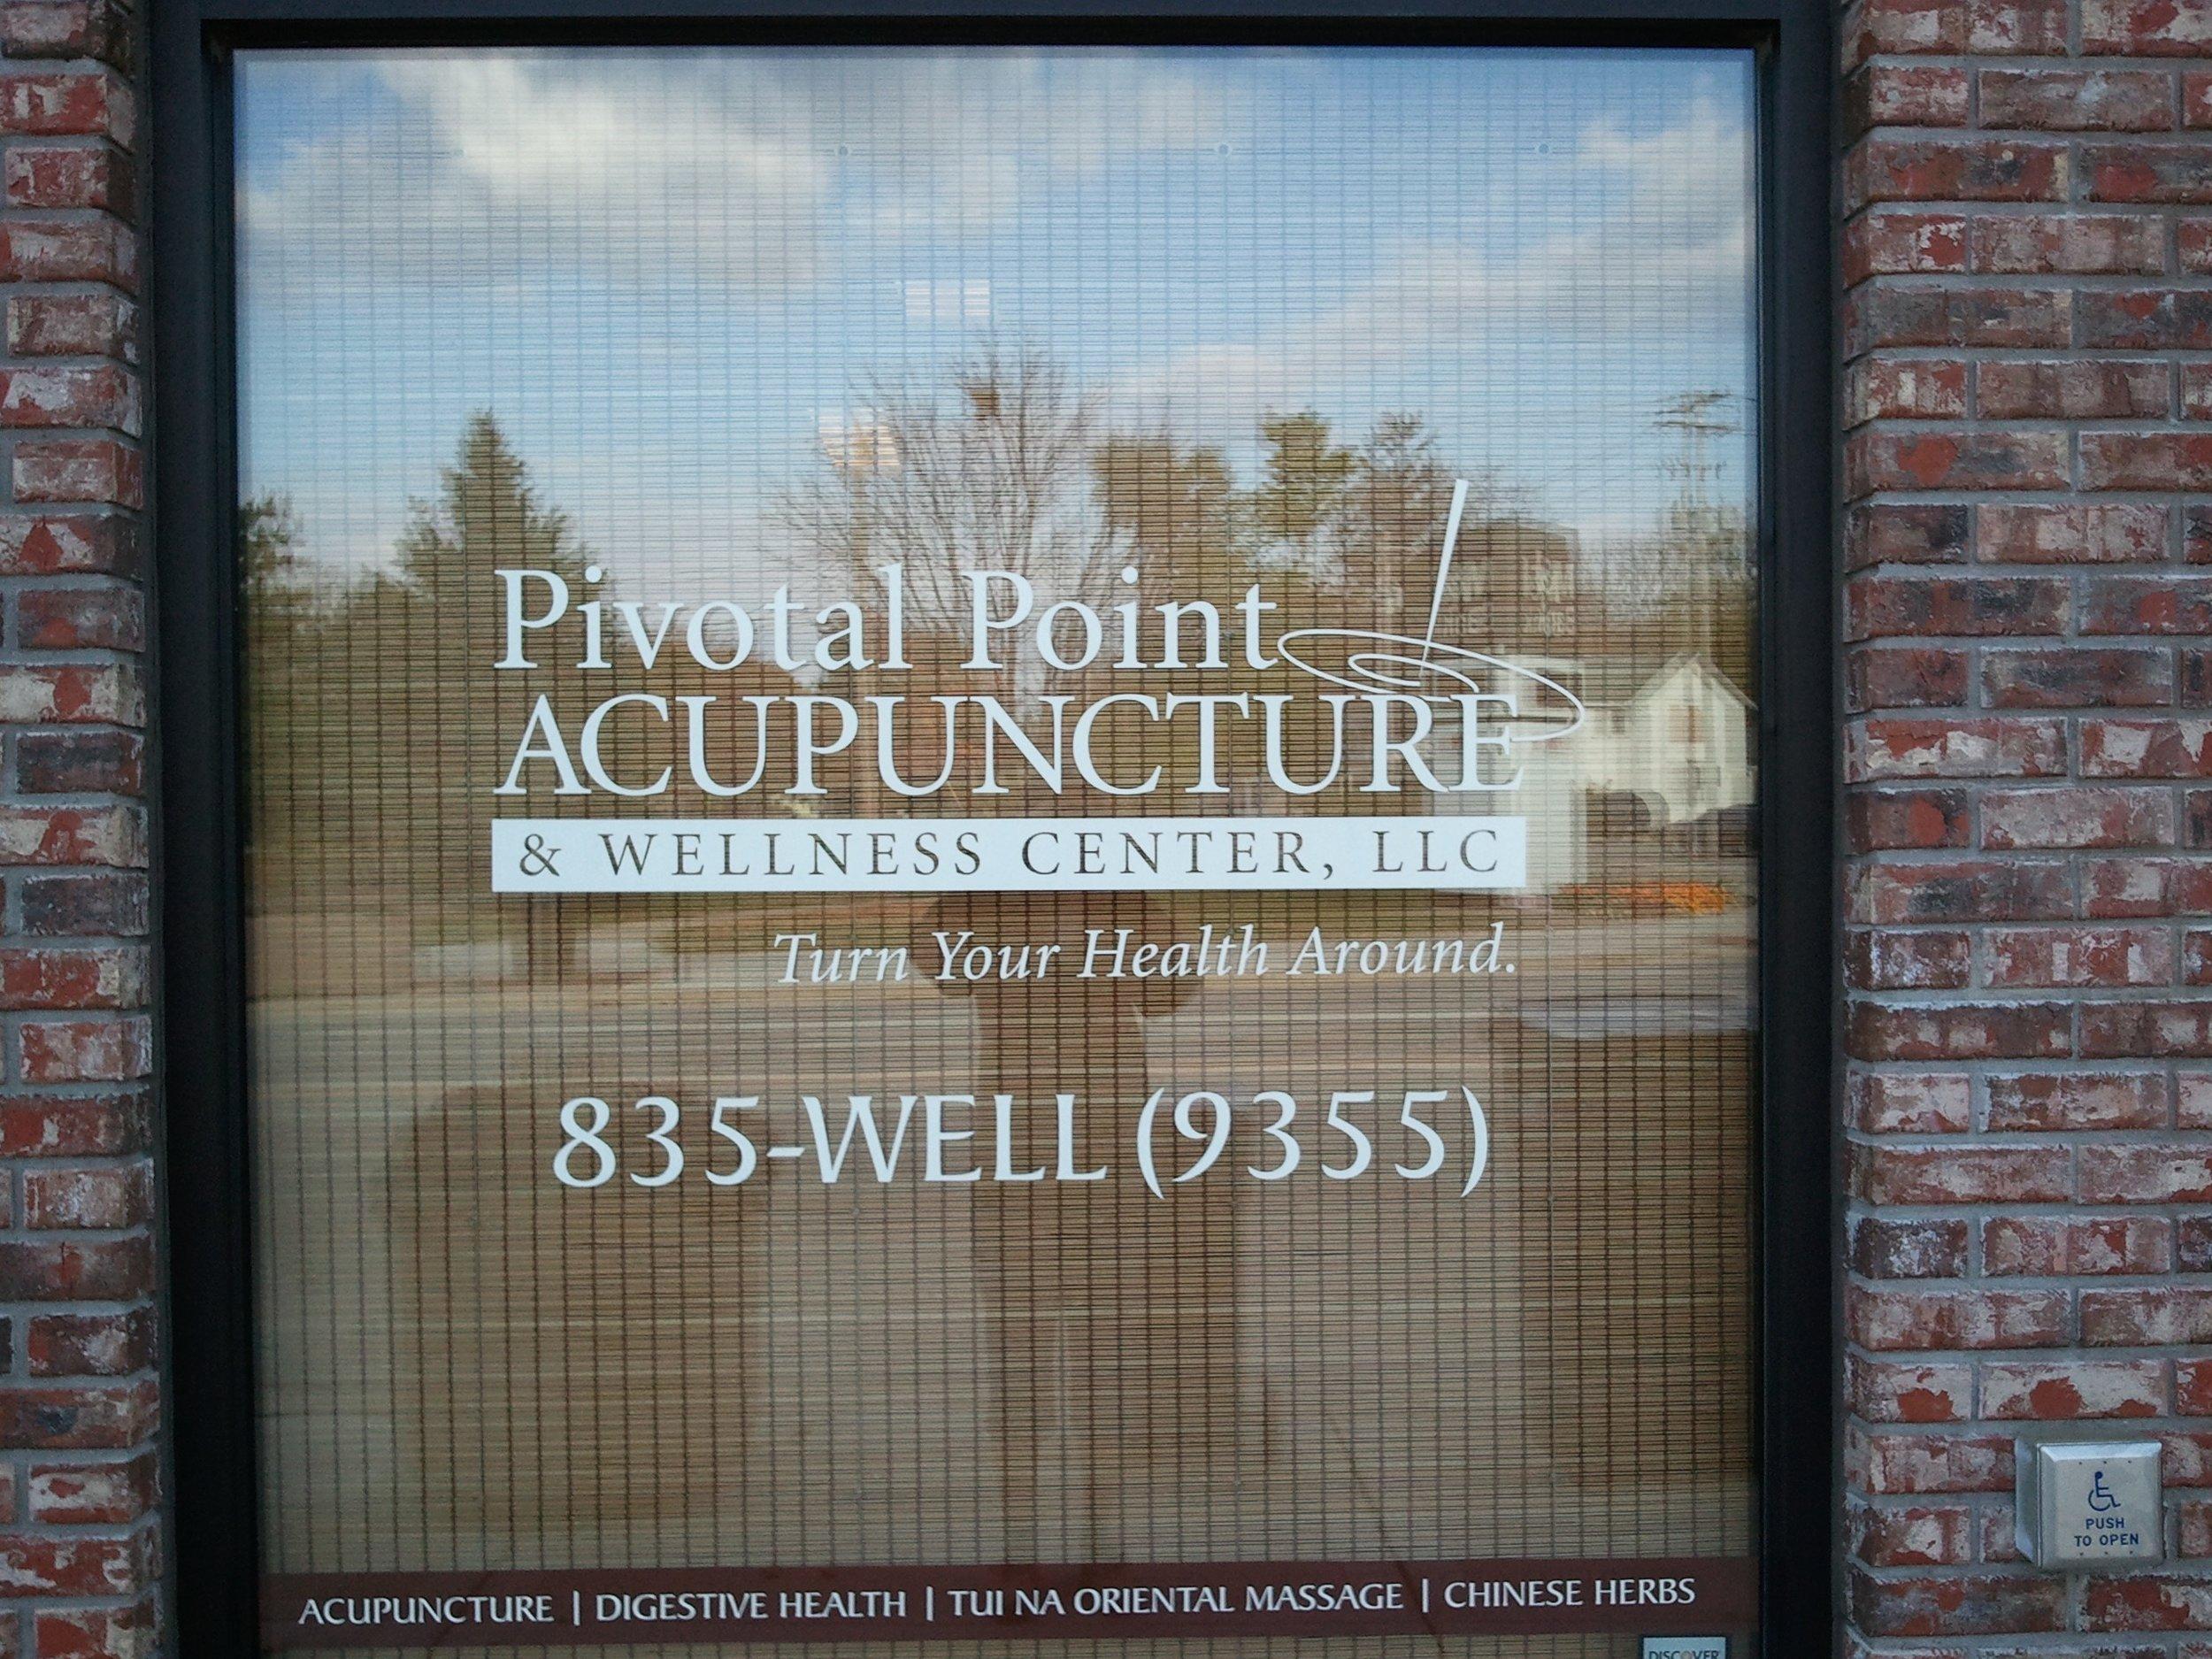 window_lettering_piv_point.jpg